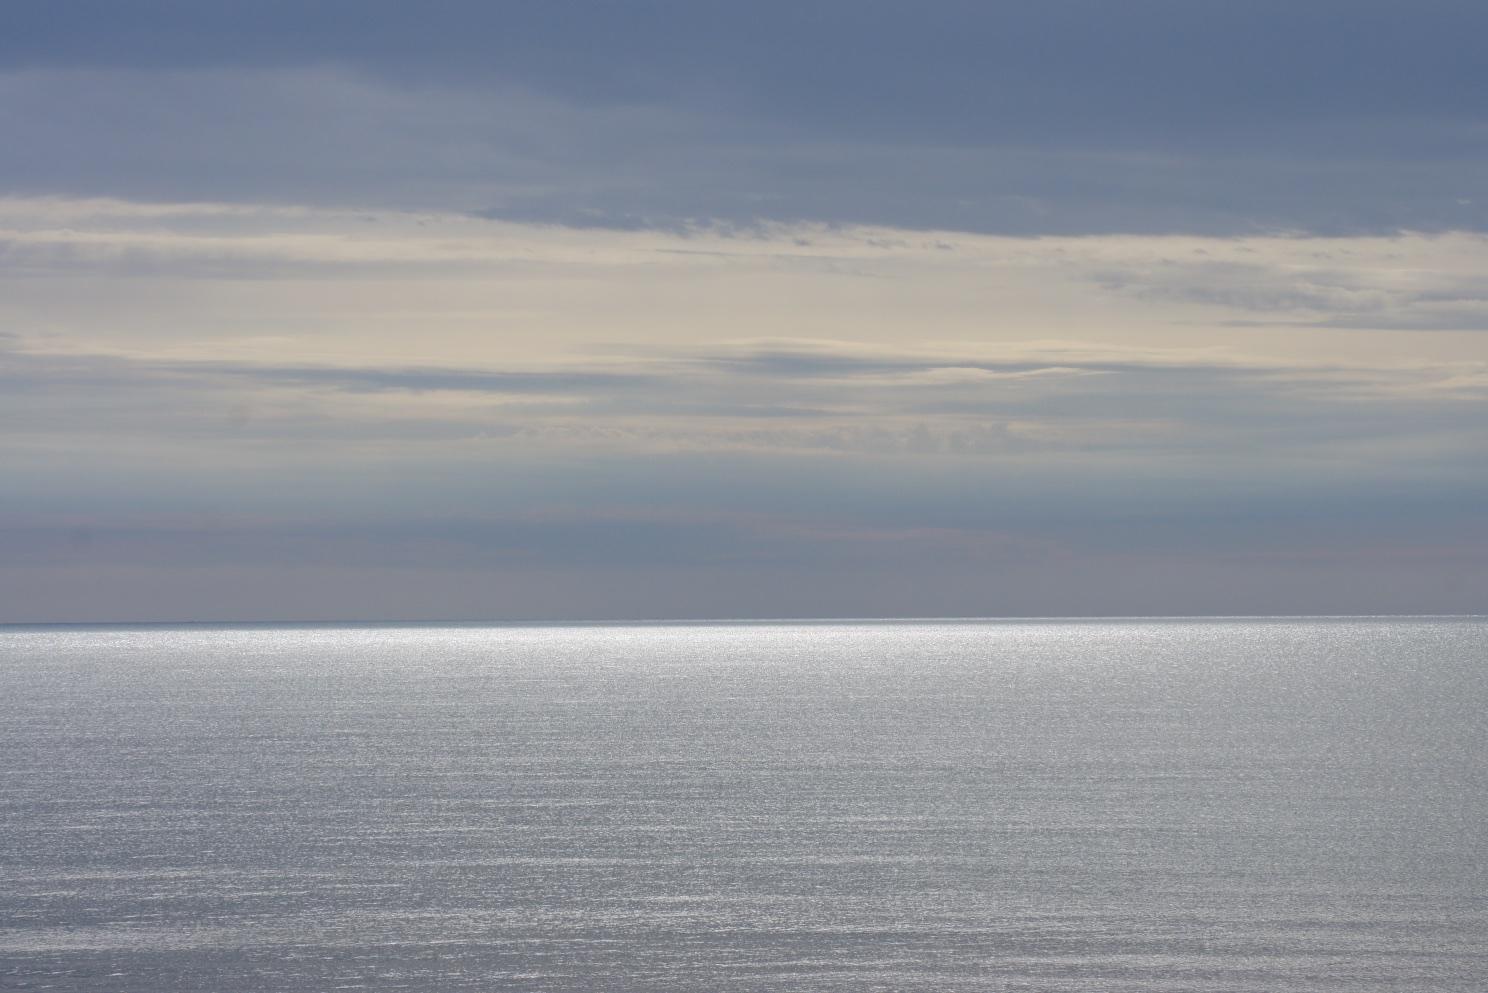 Mer argentée, Qerret, 11 septembre 2014